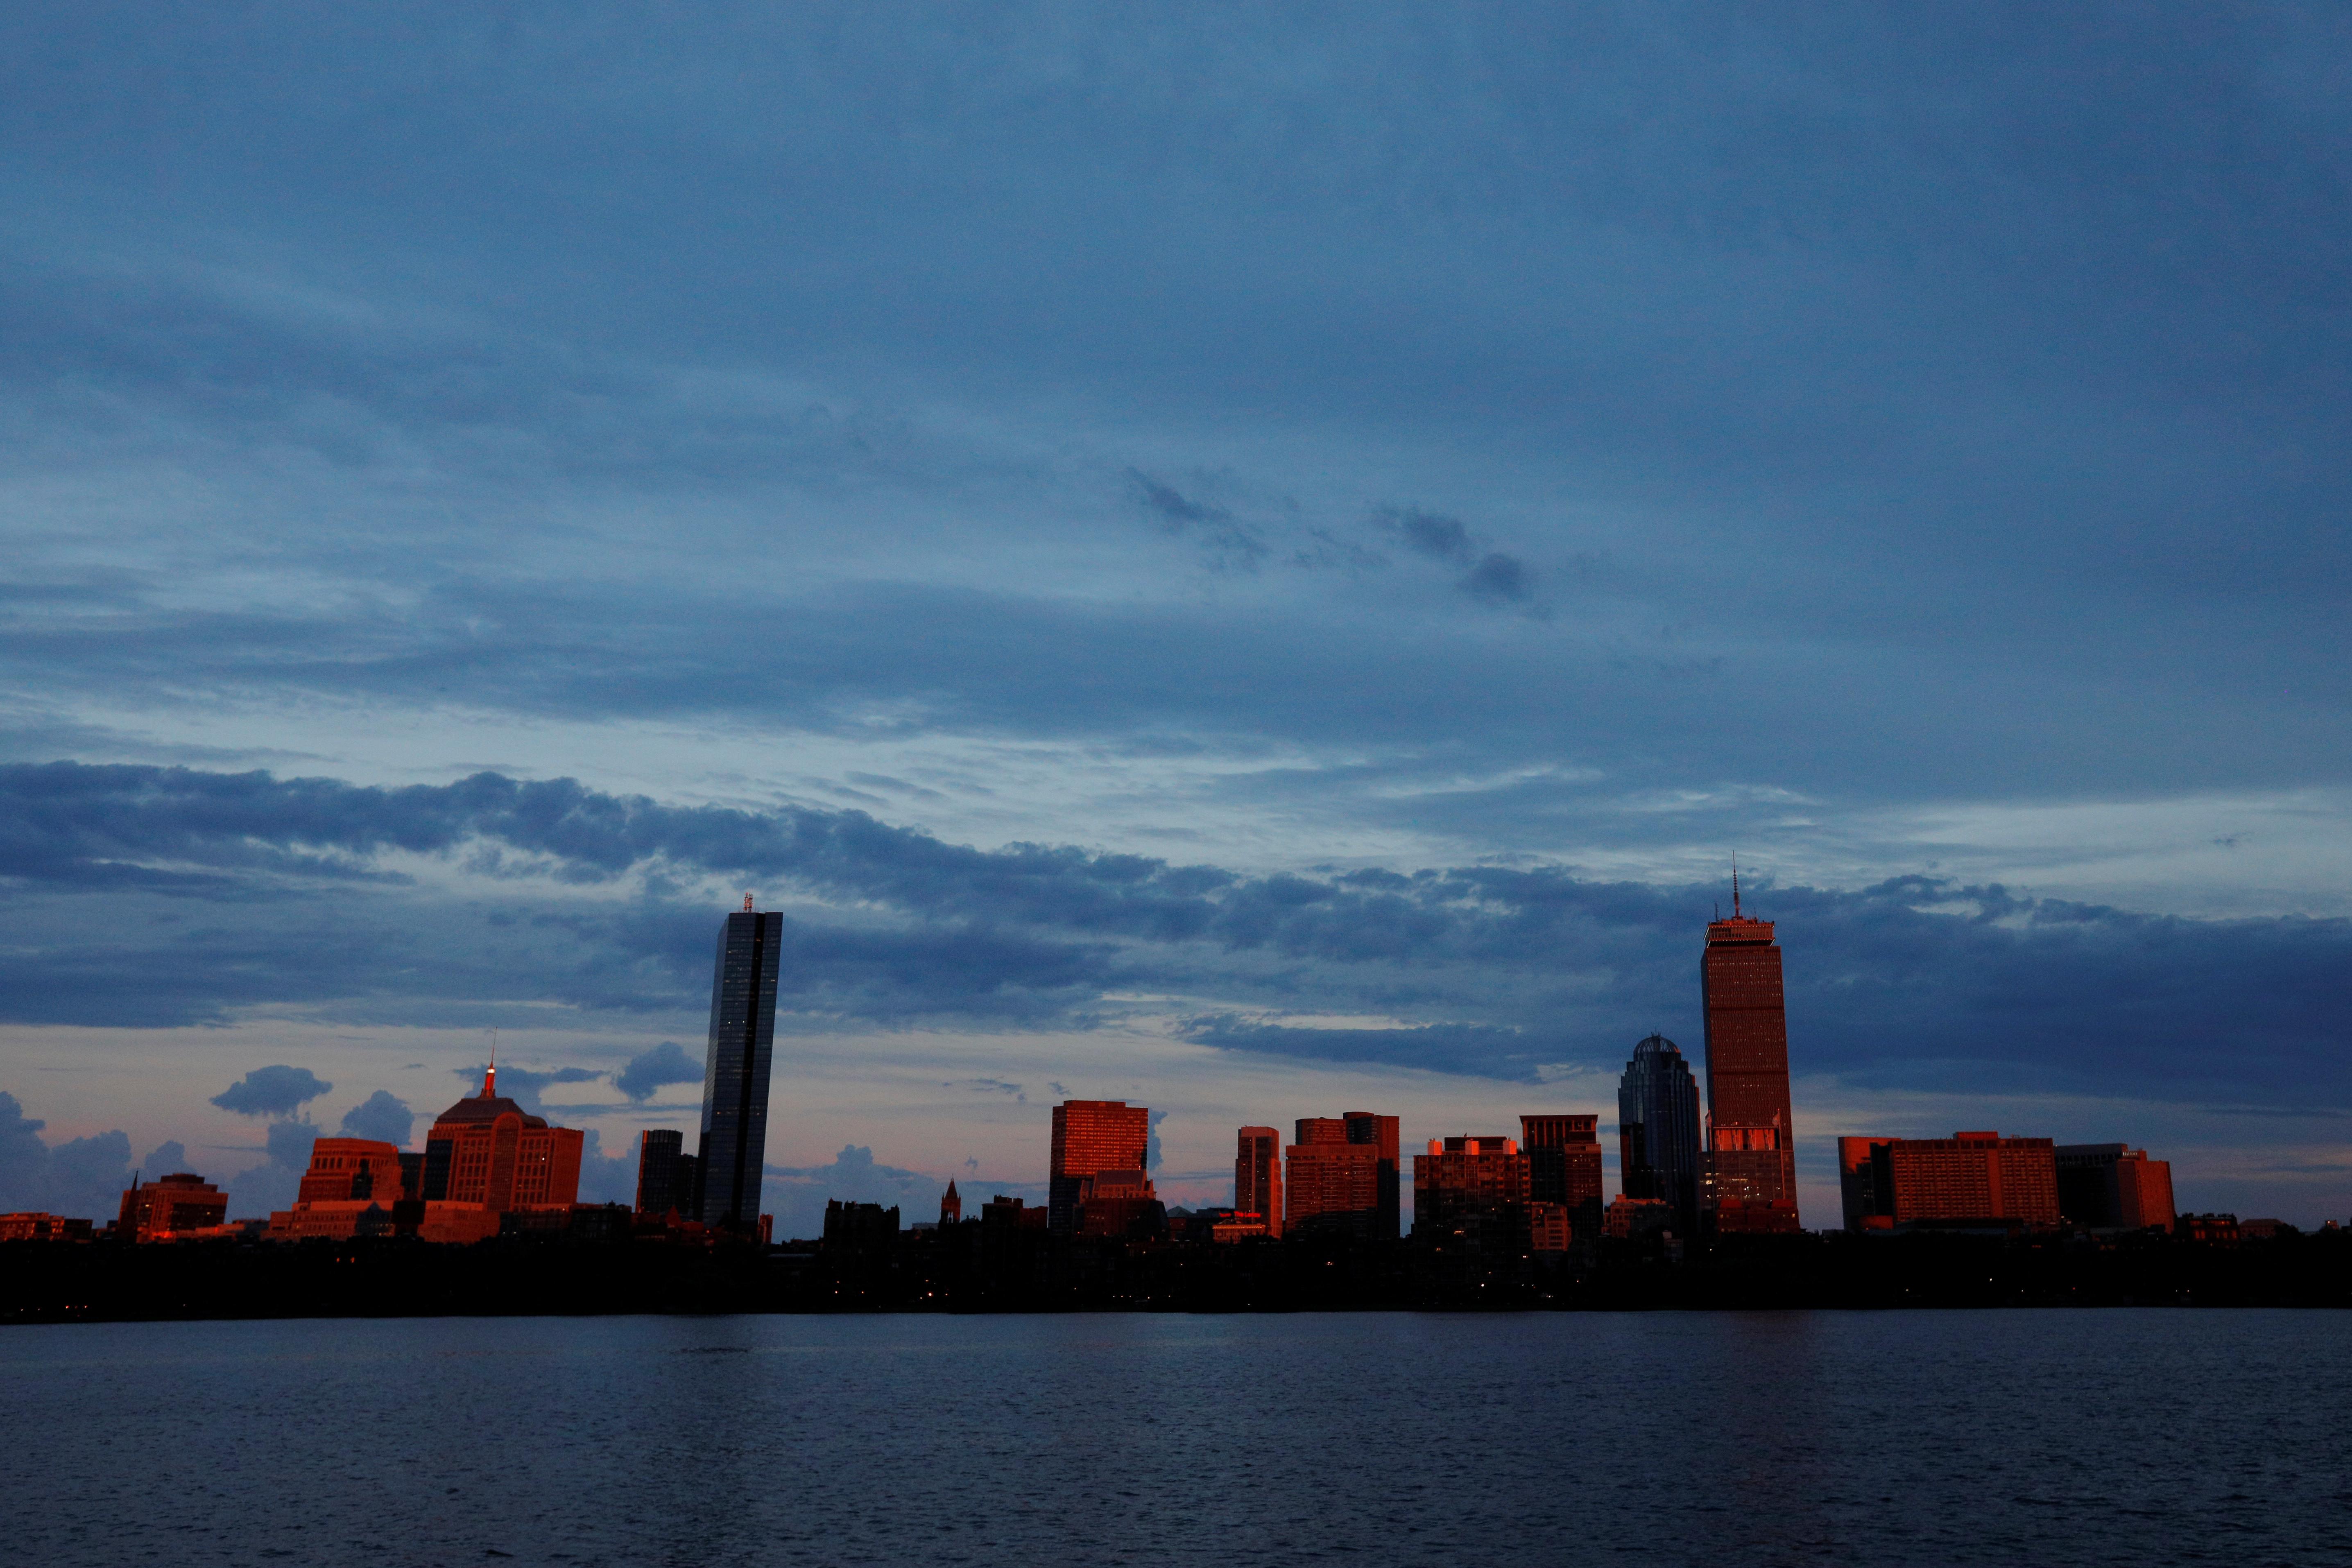 The setting sun reflects off the Boston skyline across the Charles River in Cambridge, Massachusetts, U.S., June 27, 2017.